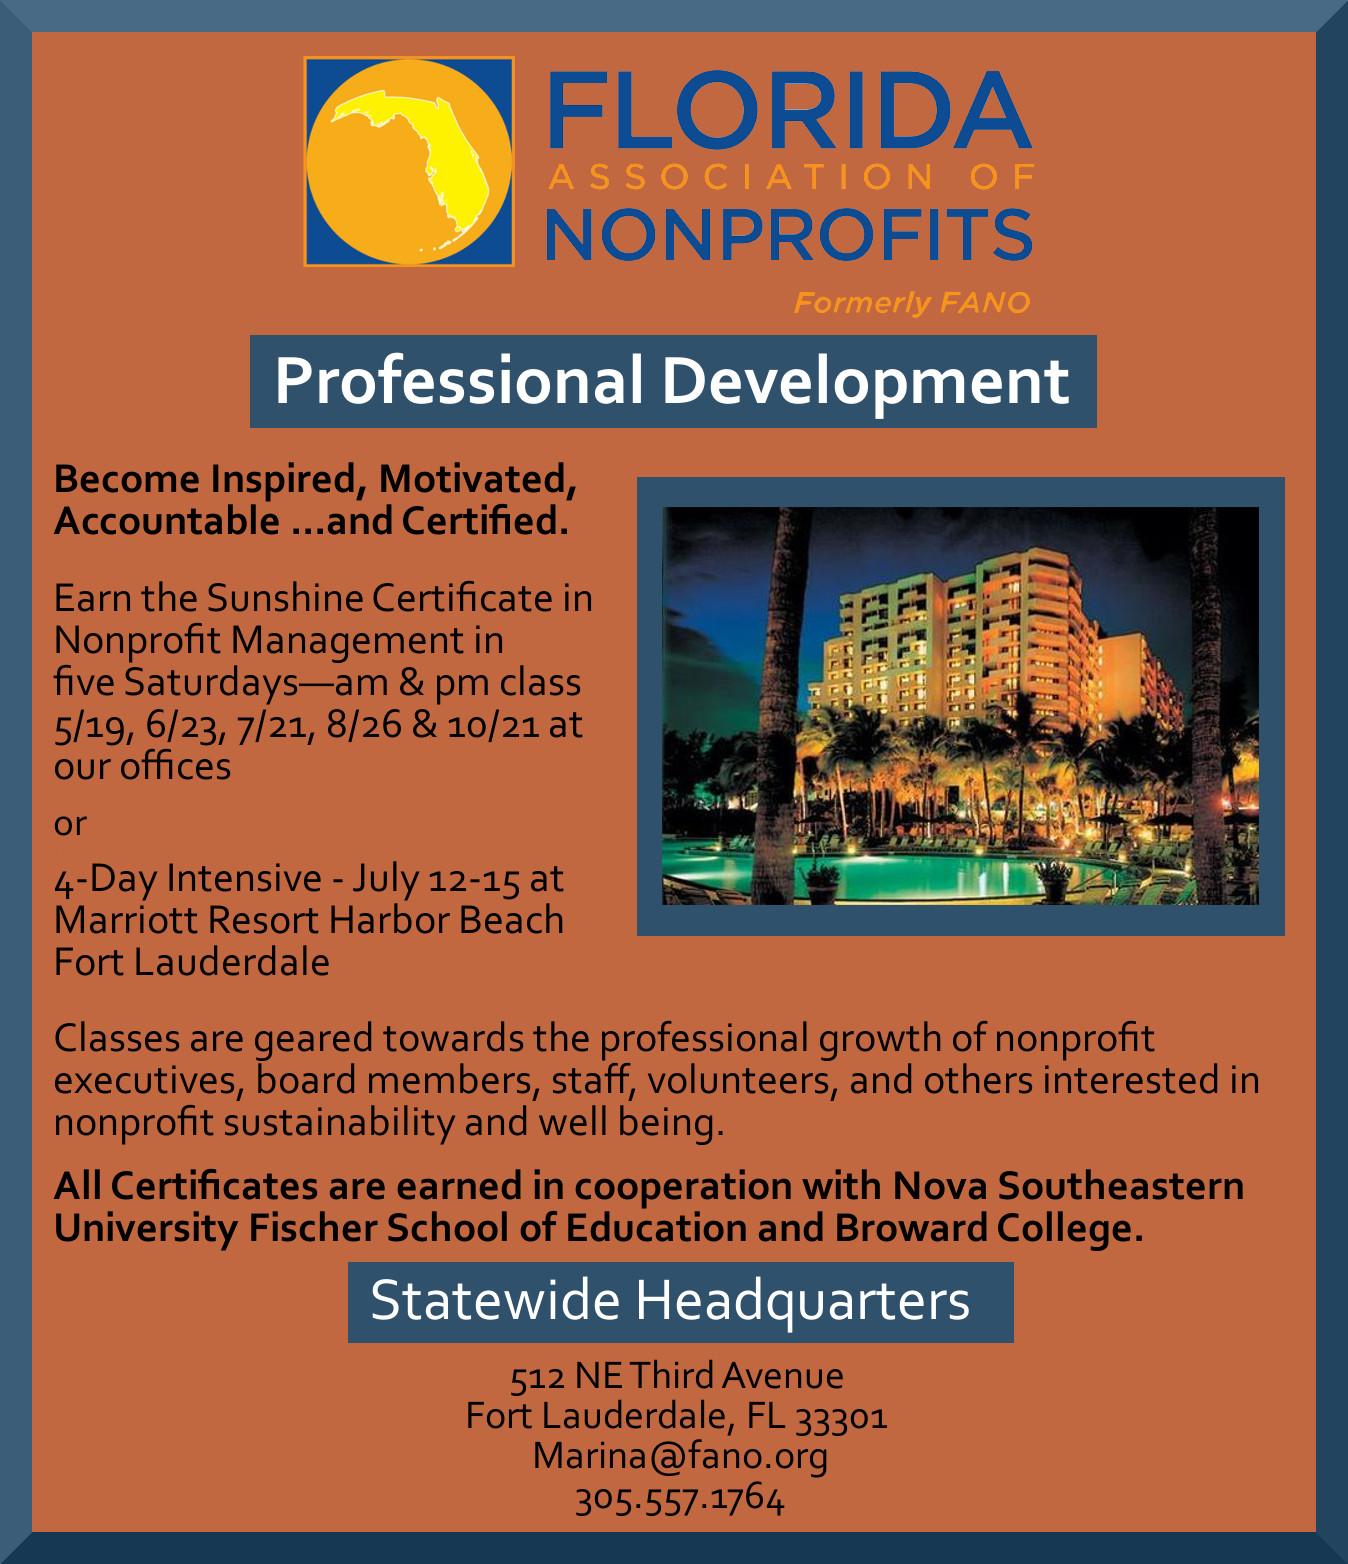 Sunshine Certificate in Nonprofit Management | The Children\'s Trust